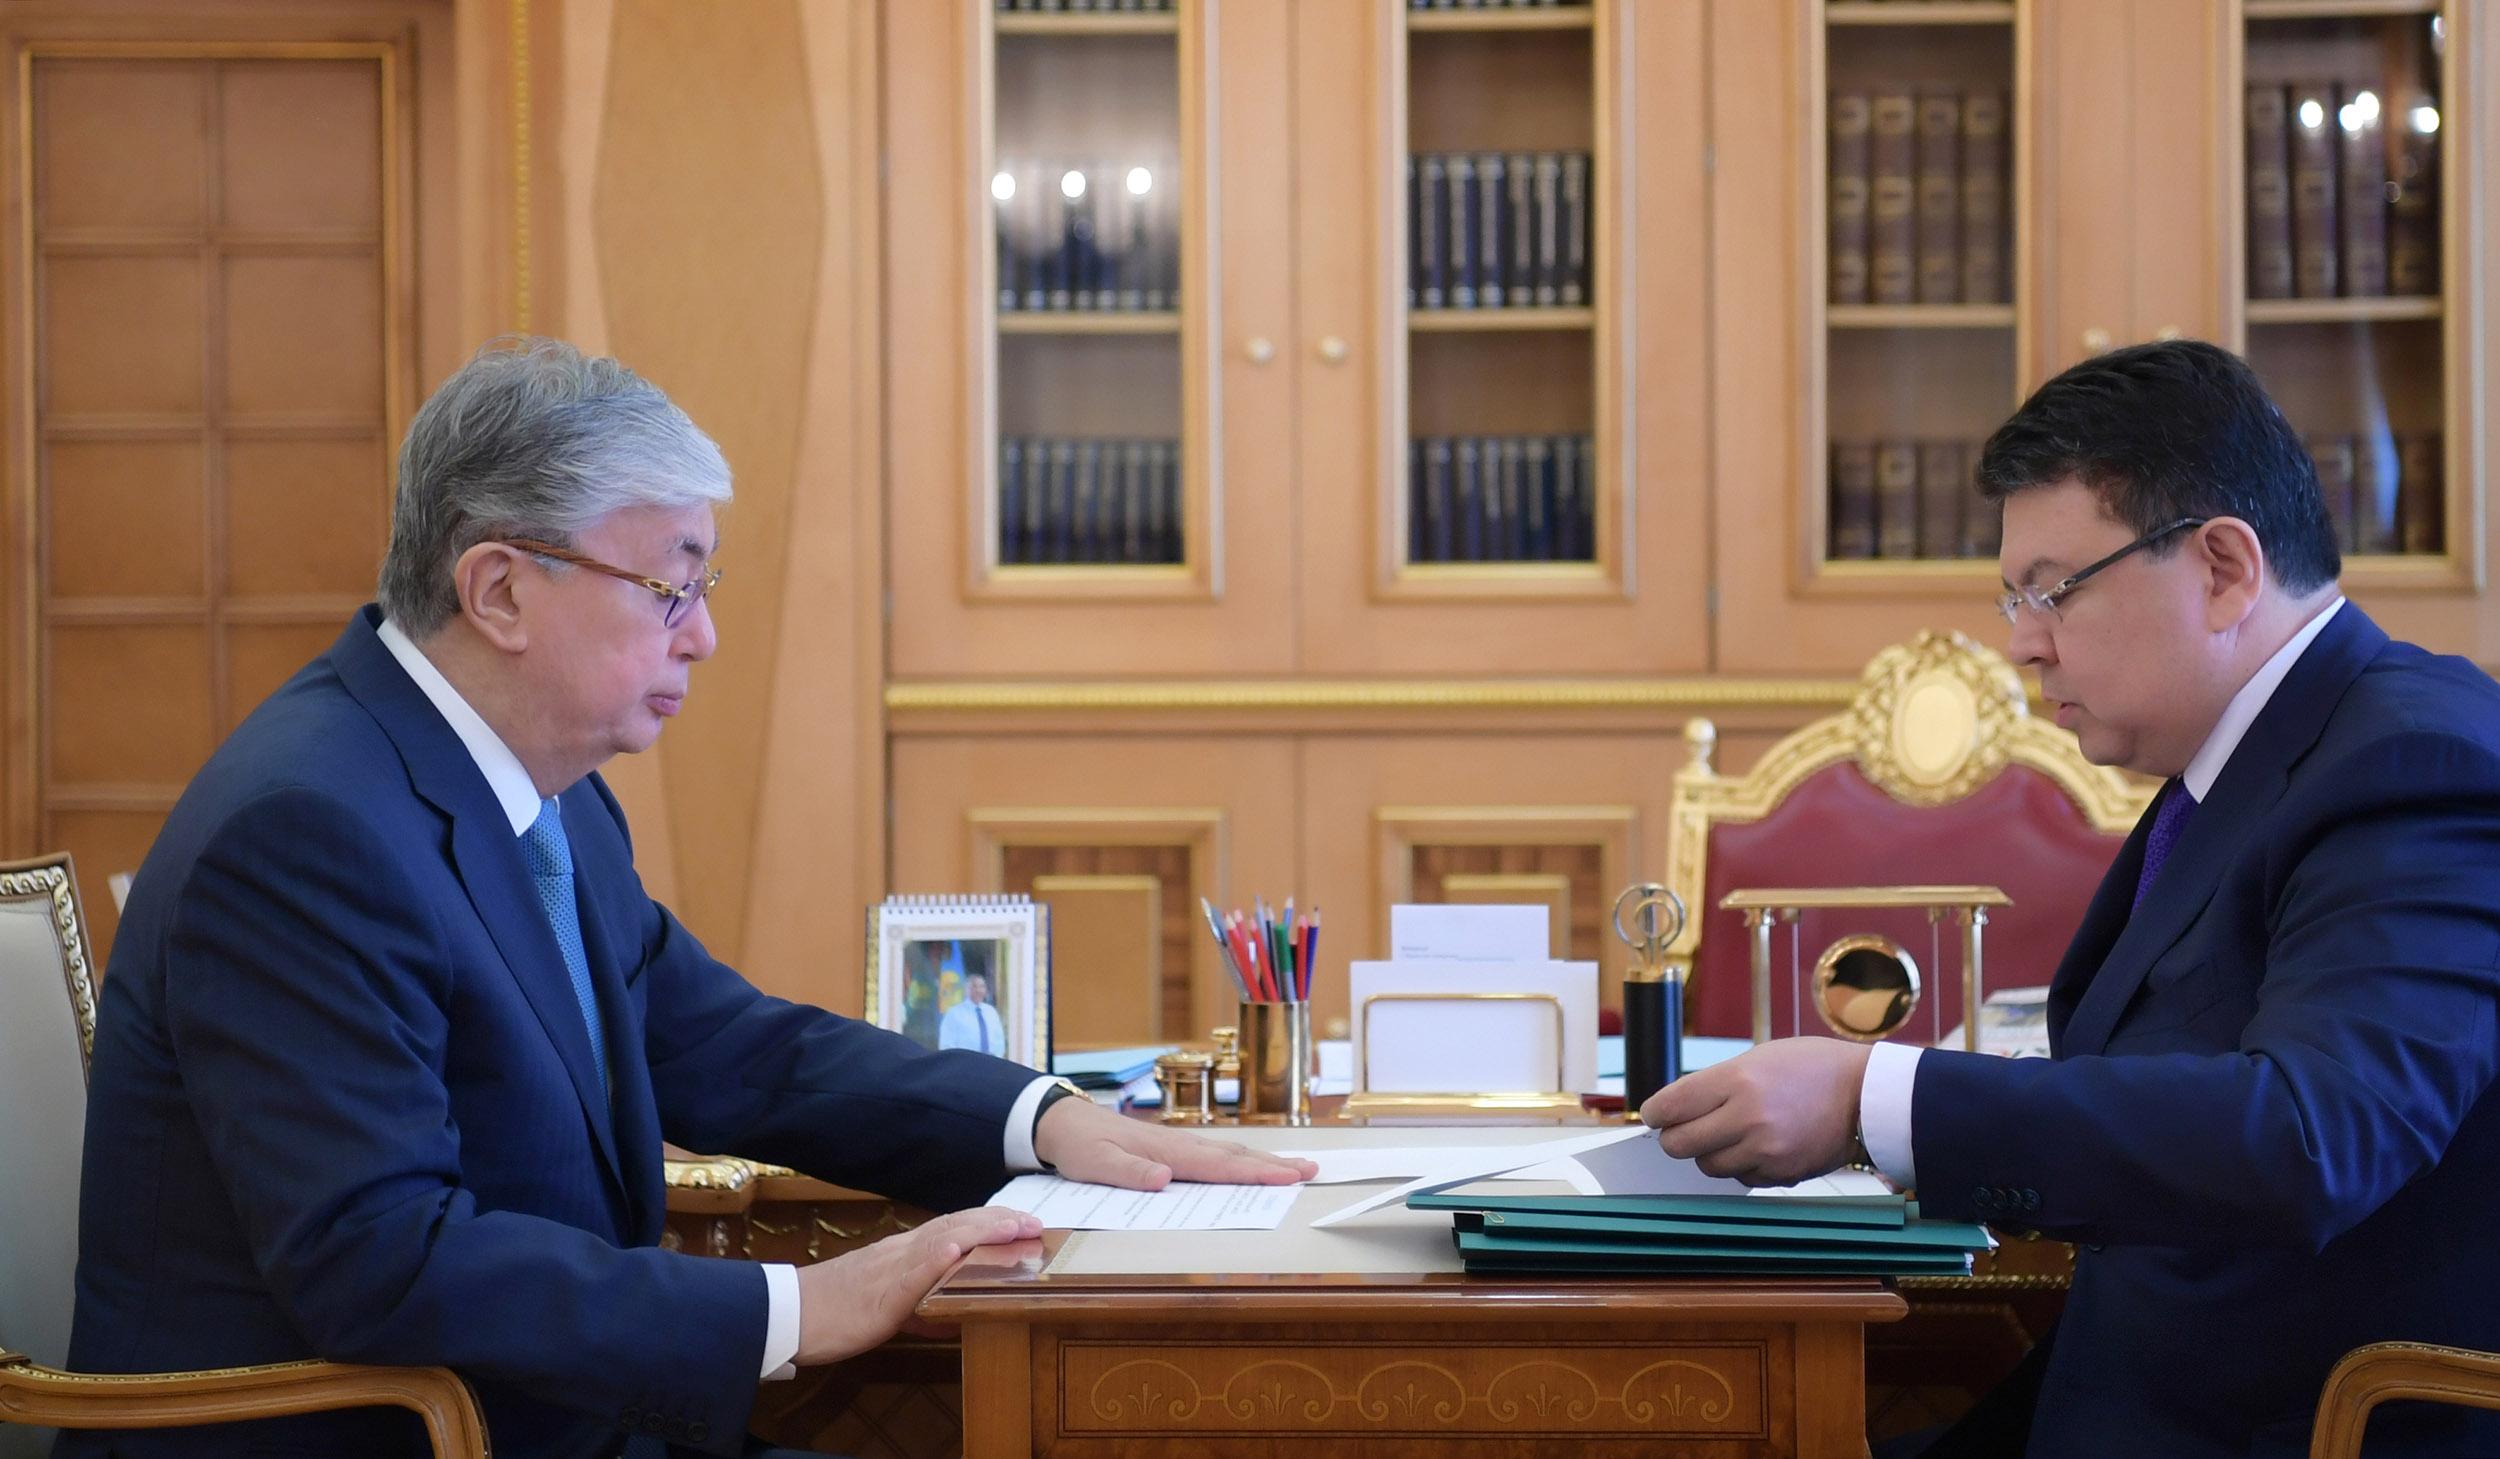 Қасым-Жомарт Тоқаев энергетика министріне тапсырма берді